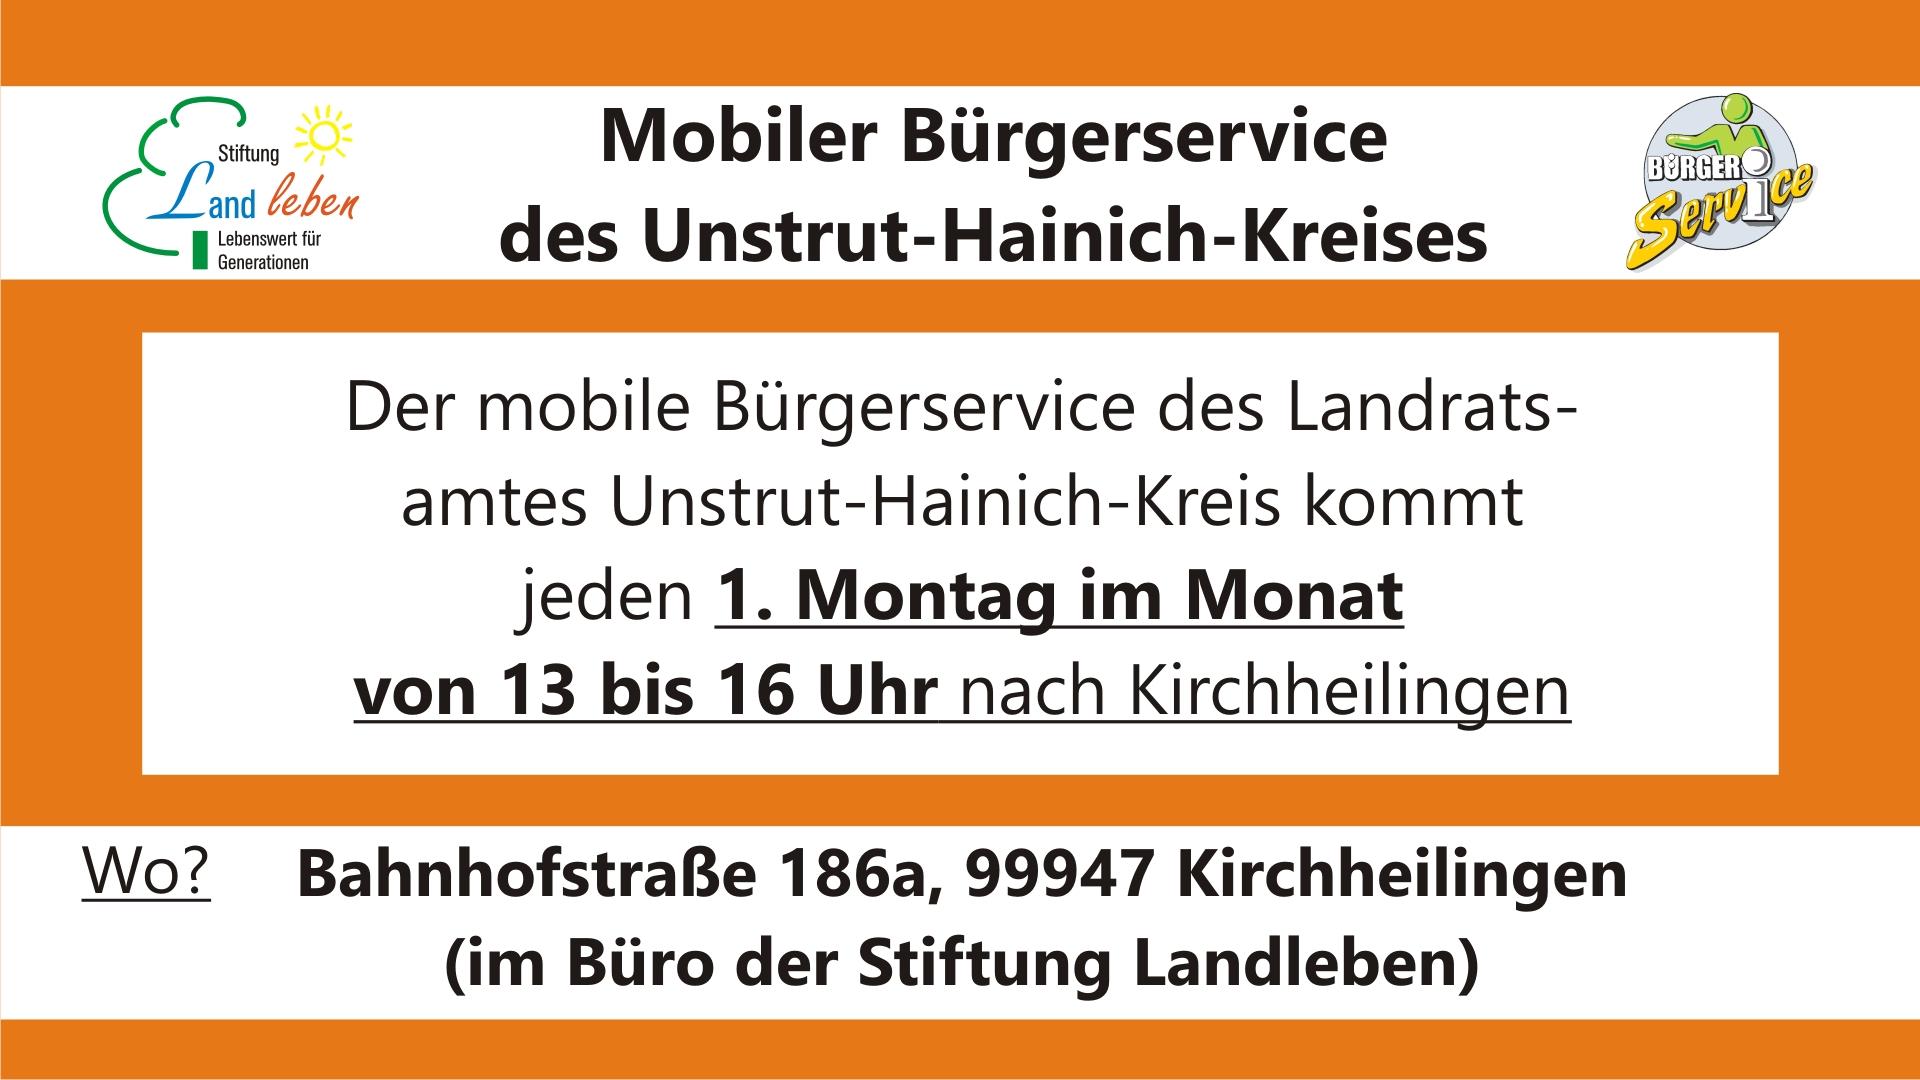 mobiler_buergerservice